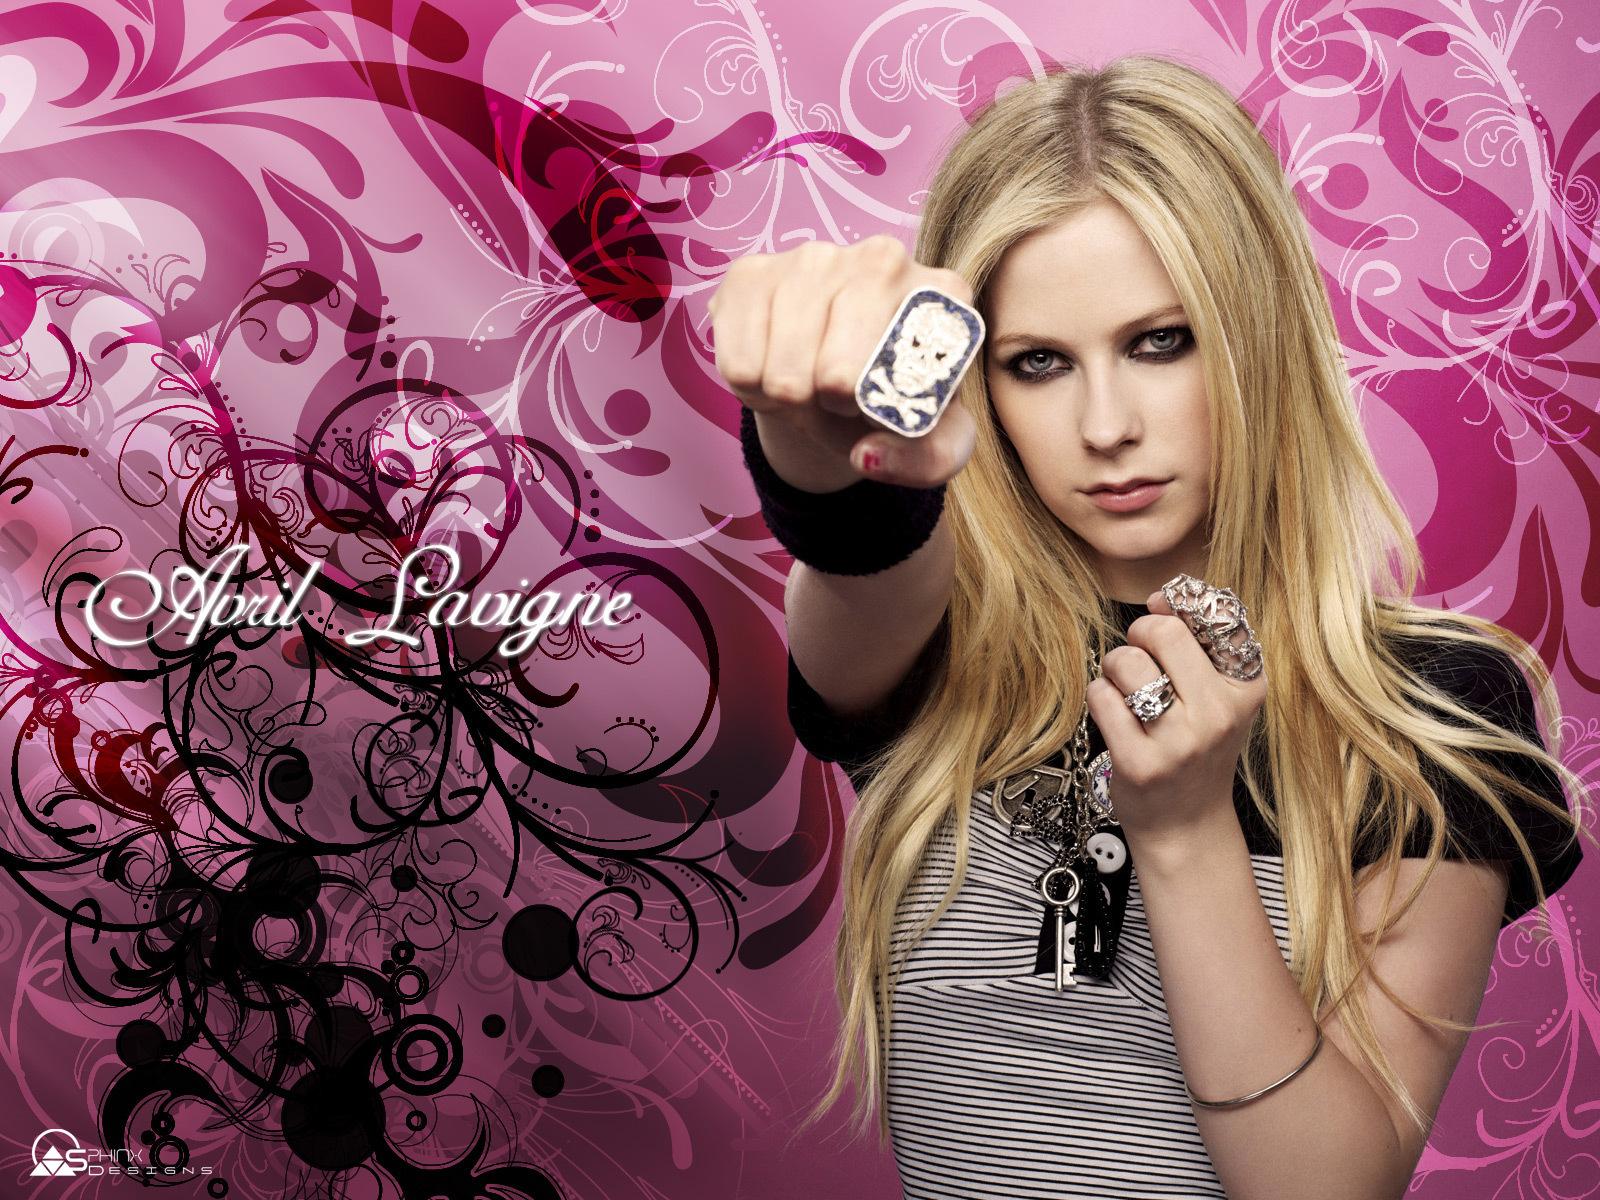 Download Avril lavigne guitar iphone wallpaper Desi girl